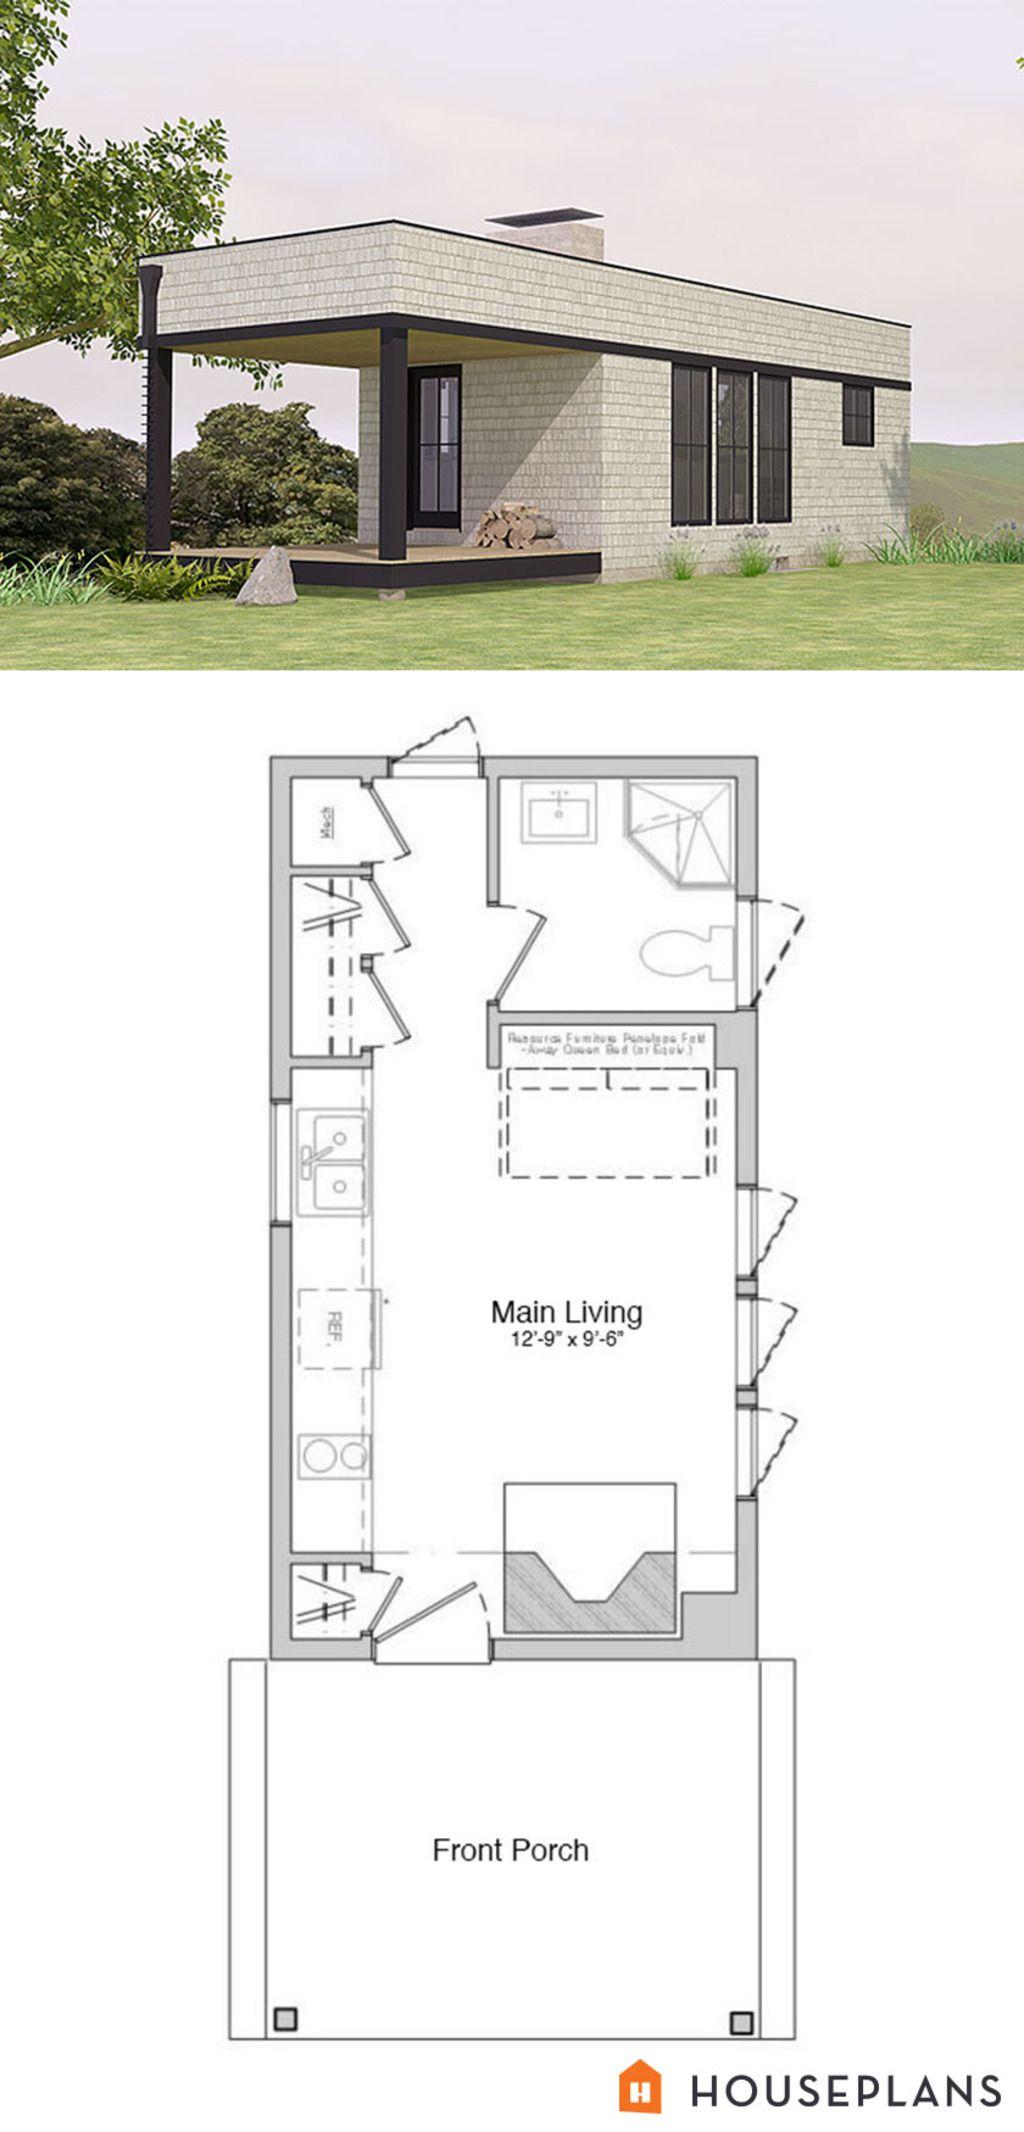 Modern Style House Plan 1 Beds 1 Baths 312 Sq Ft Plan 914 2 Micro House Plans Modern Style House Plans Free House Plans